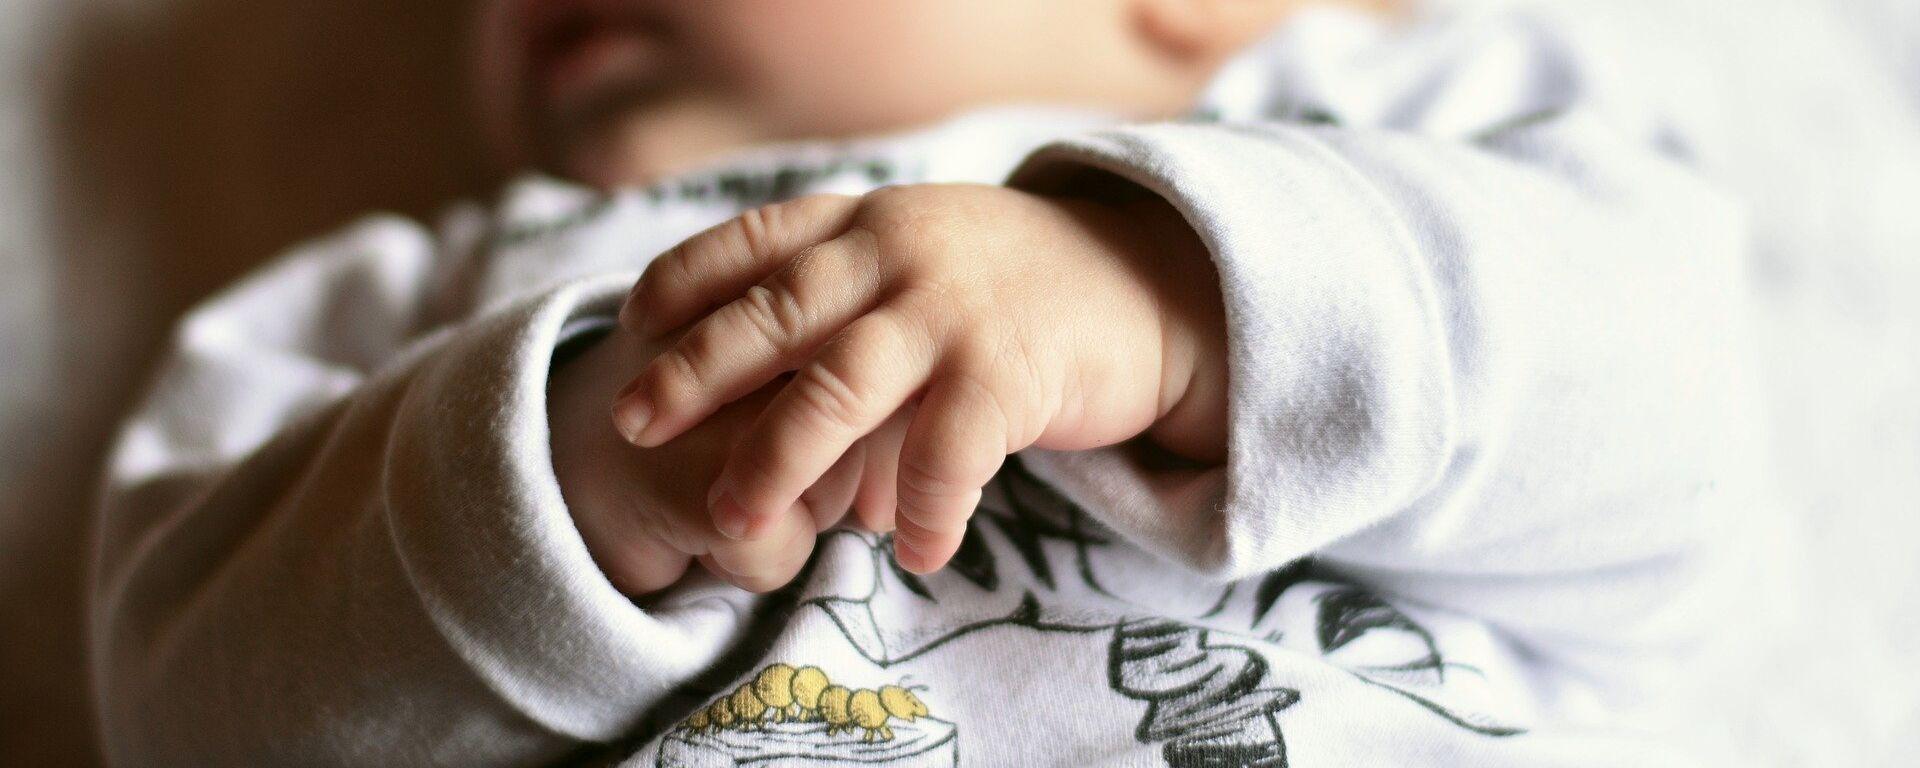 Bambino neonato - Sputnik Italia, 1920, 20.04.2021